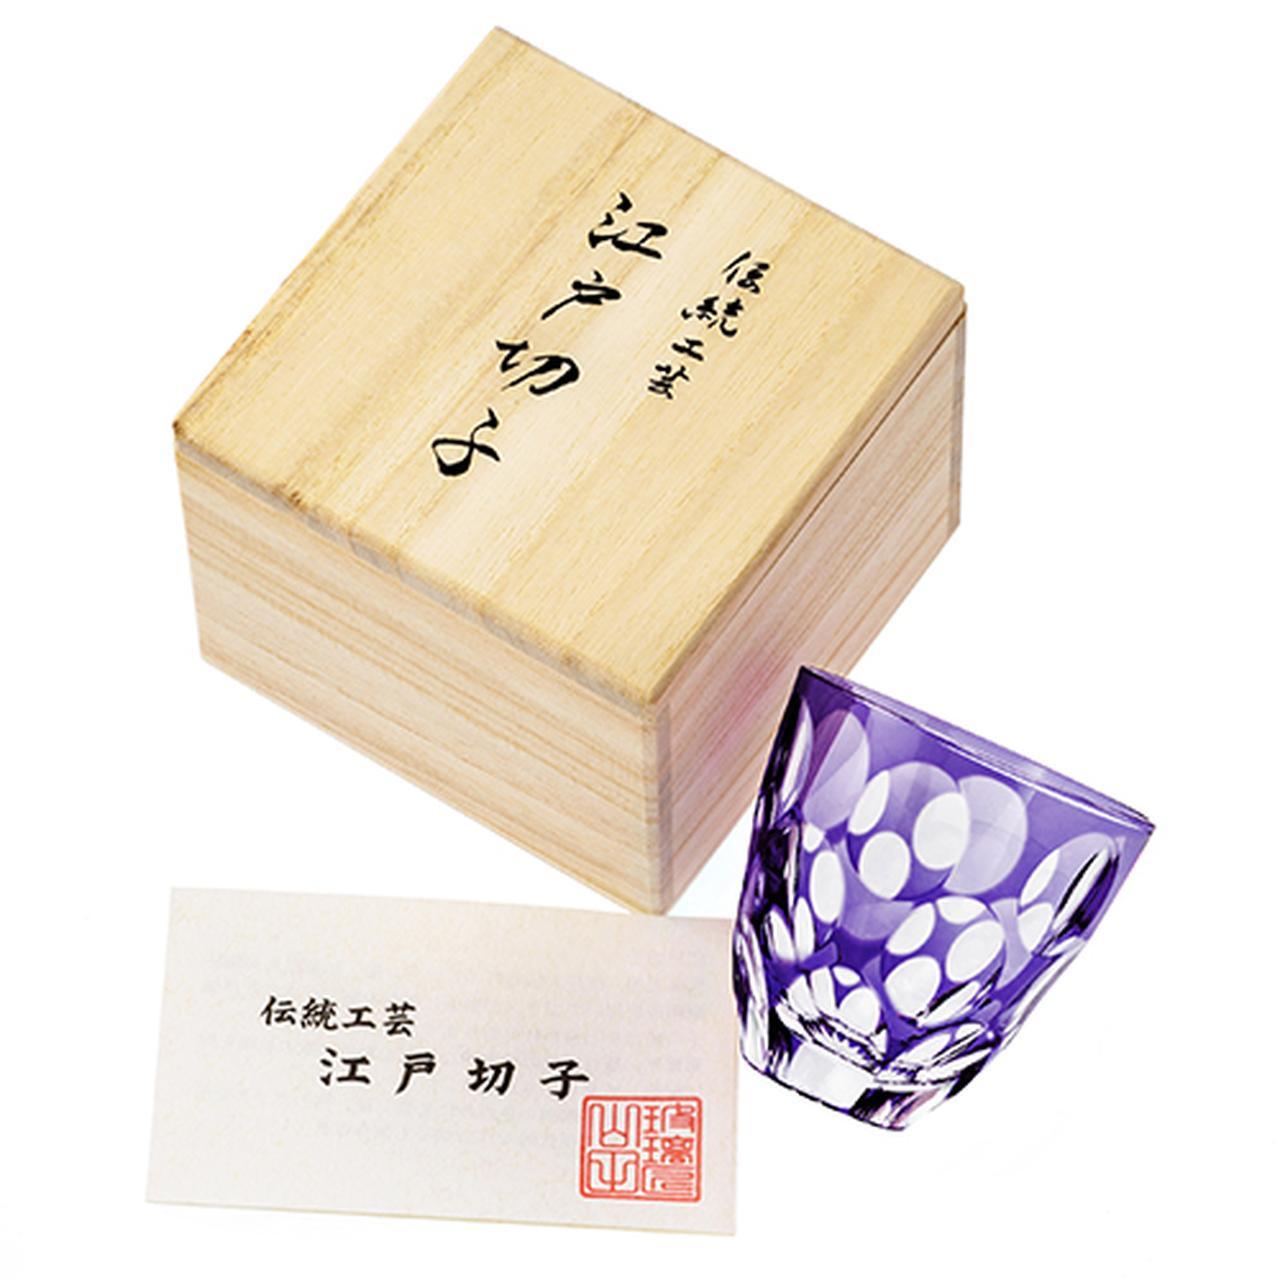 画像: 【山田硝子】江戸切子 水玉万華鏡 青藍・紫・モスグリーン